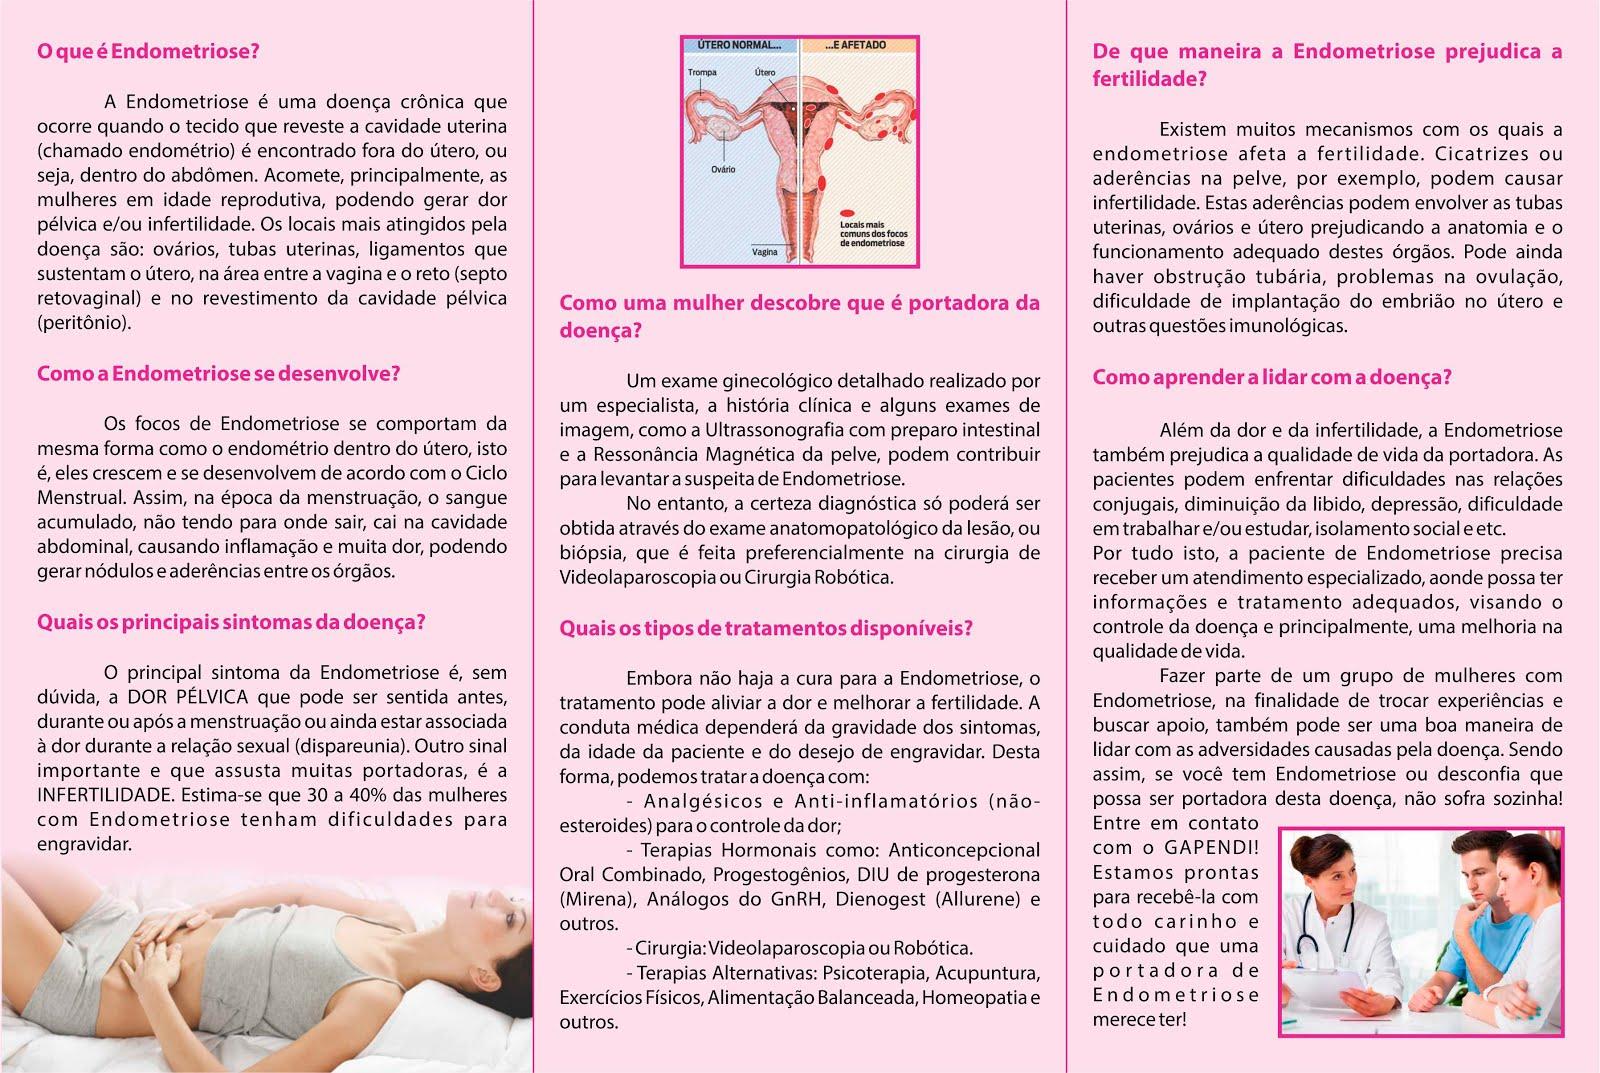 zoladex endometriose